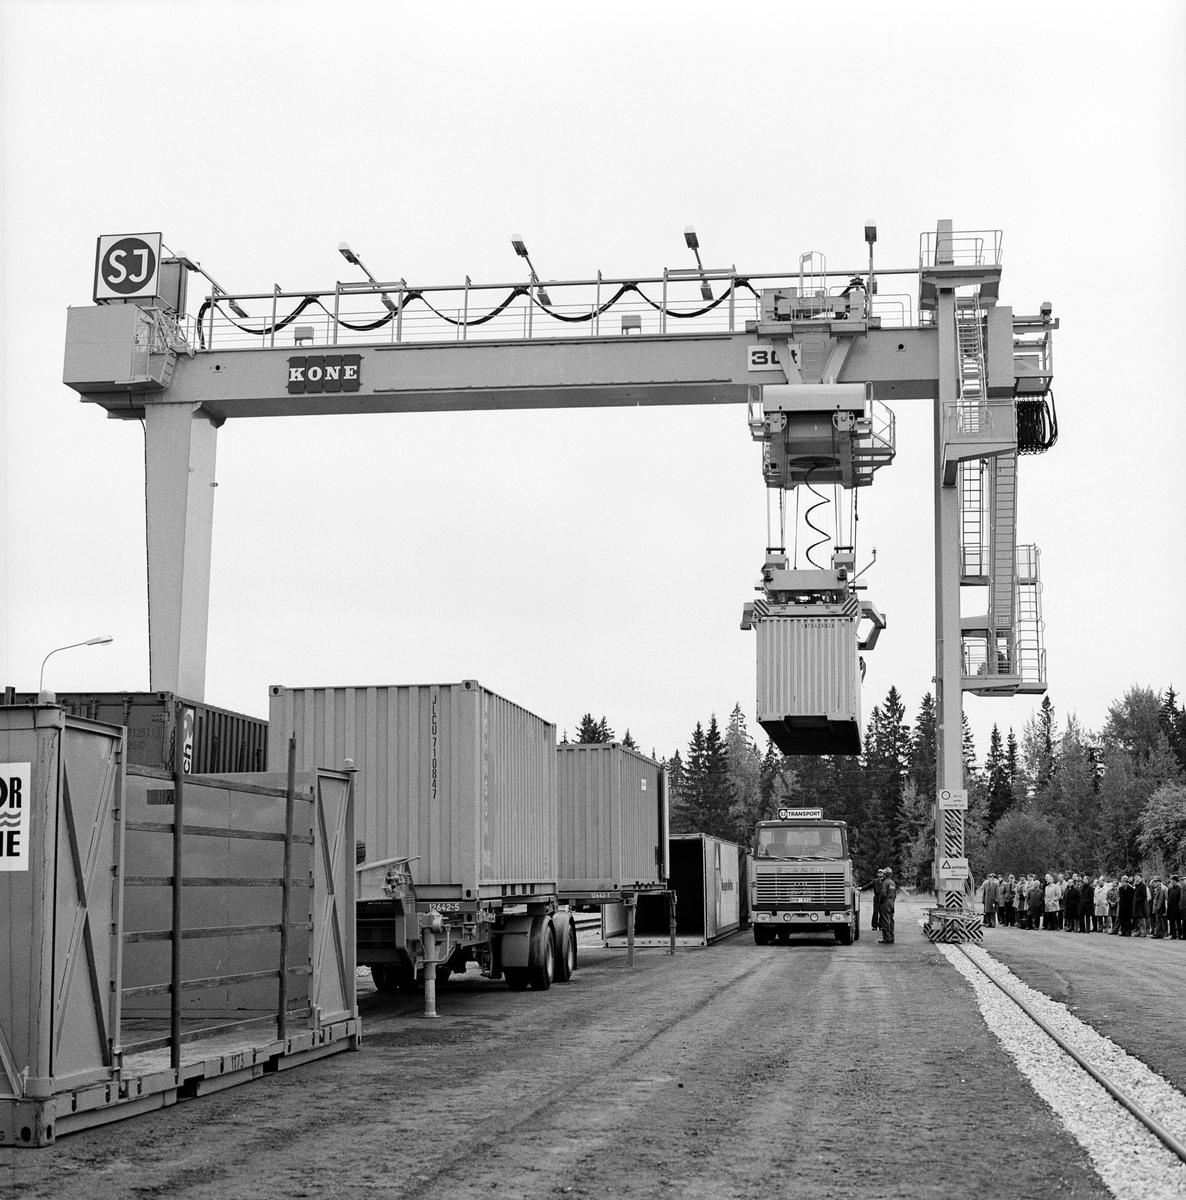 Västerås, containerterminal.